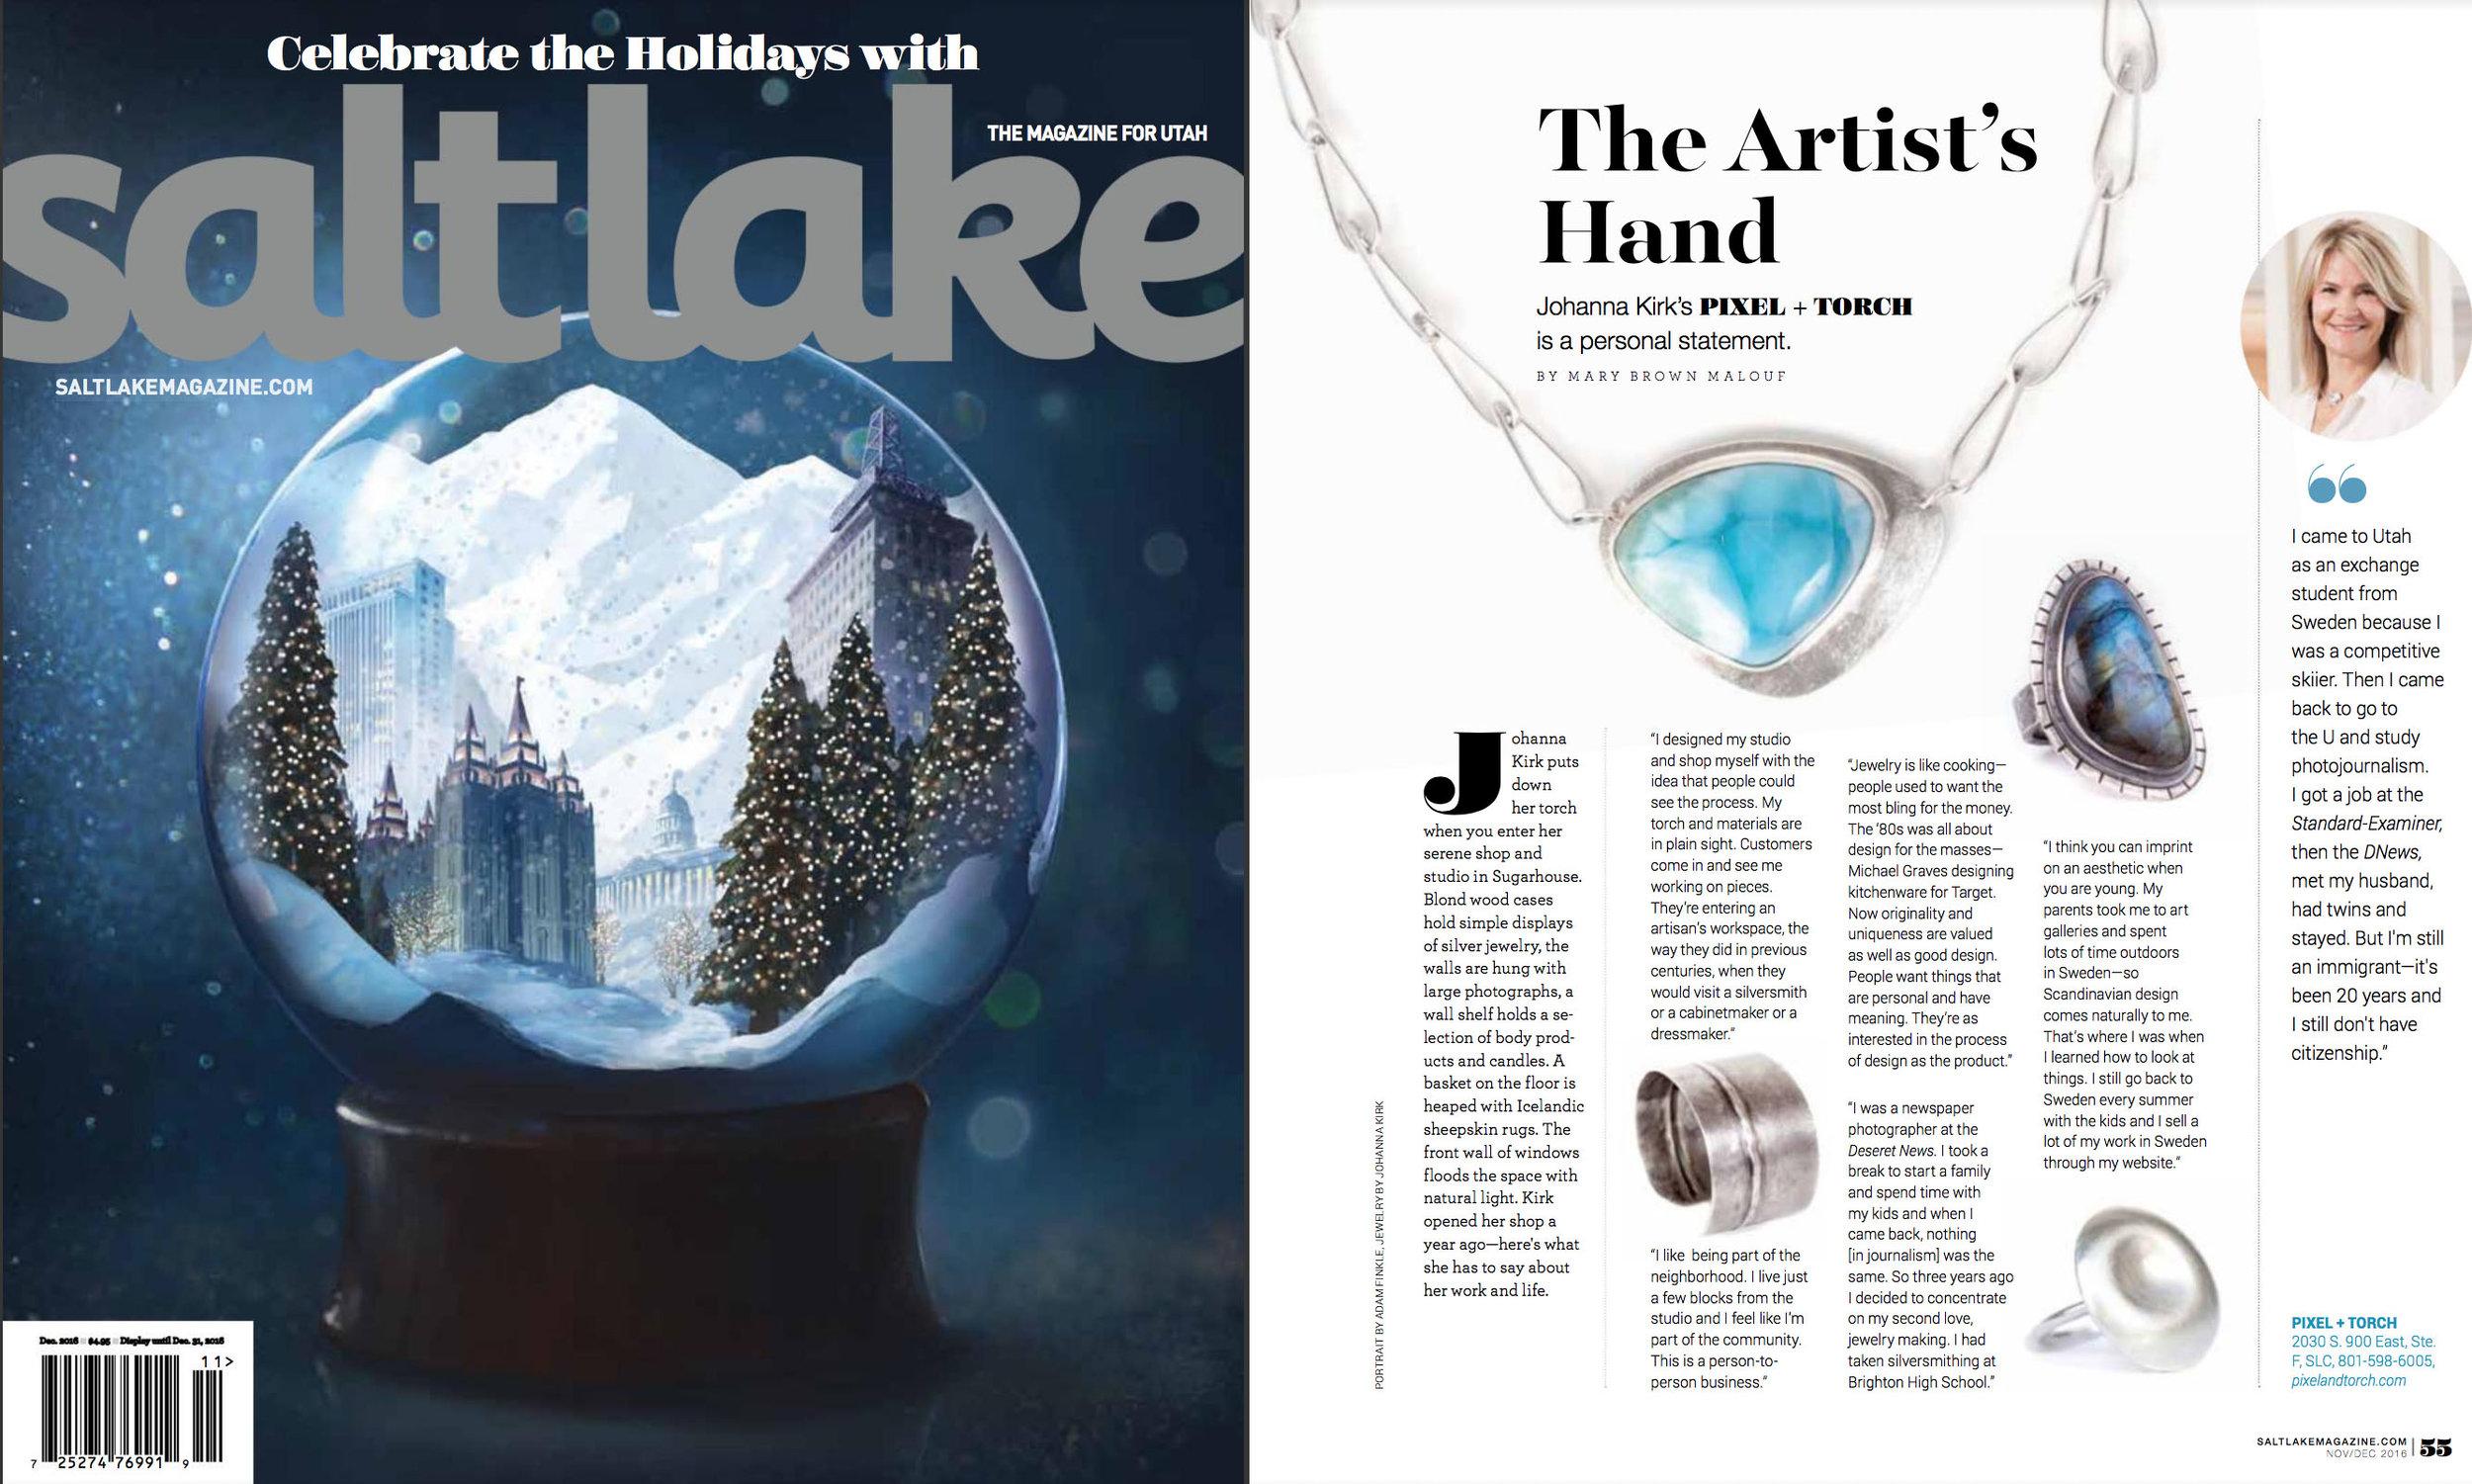 Salt Lake Magazine, December 2016.